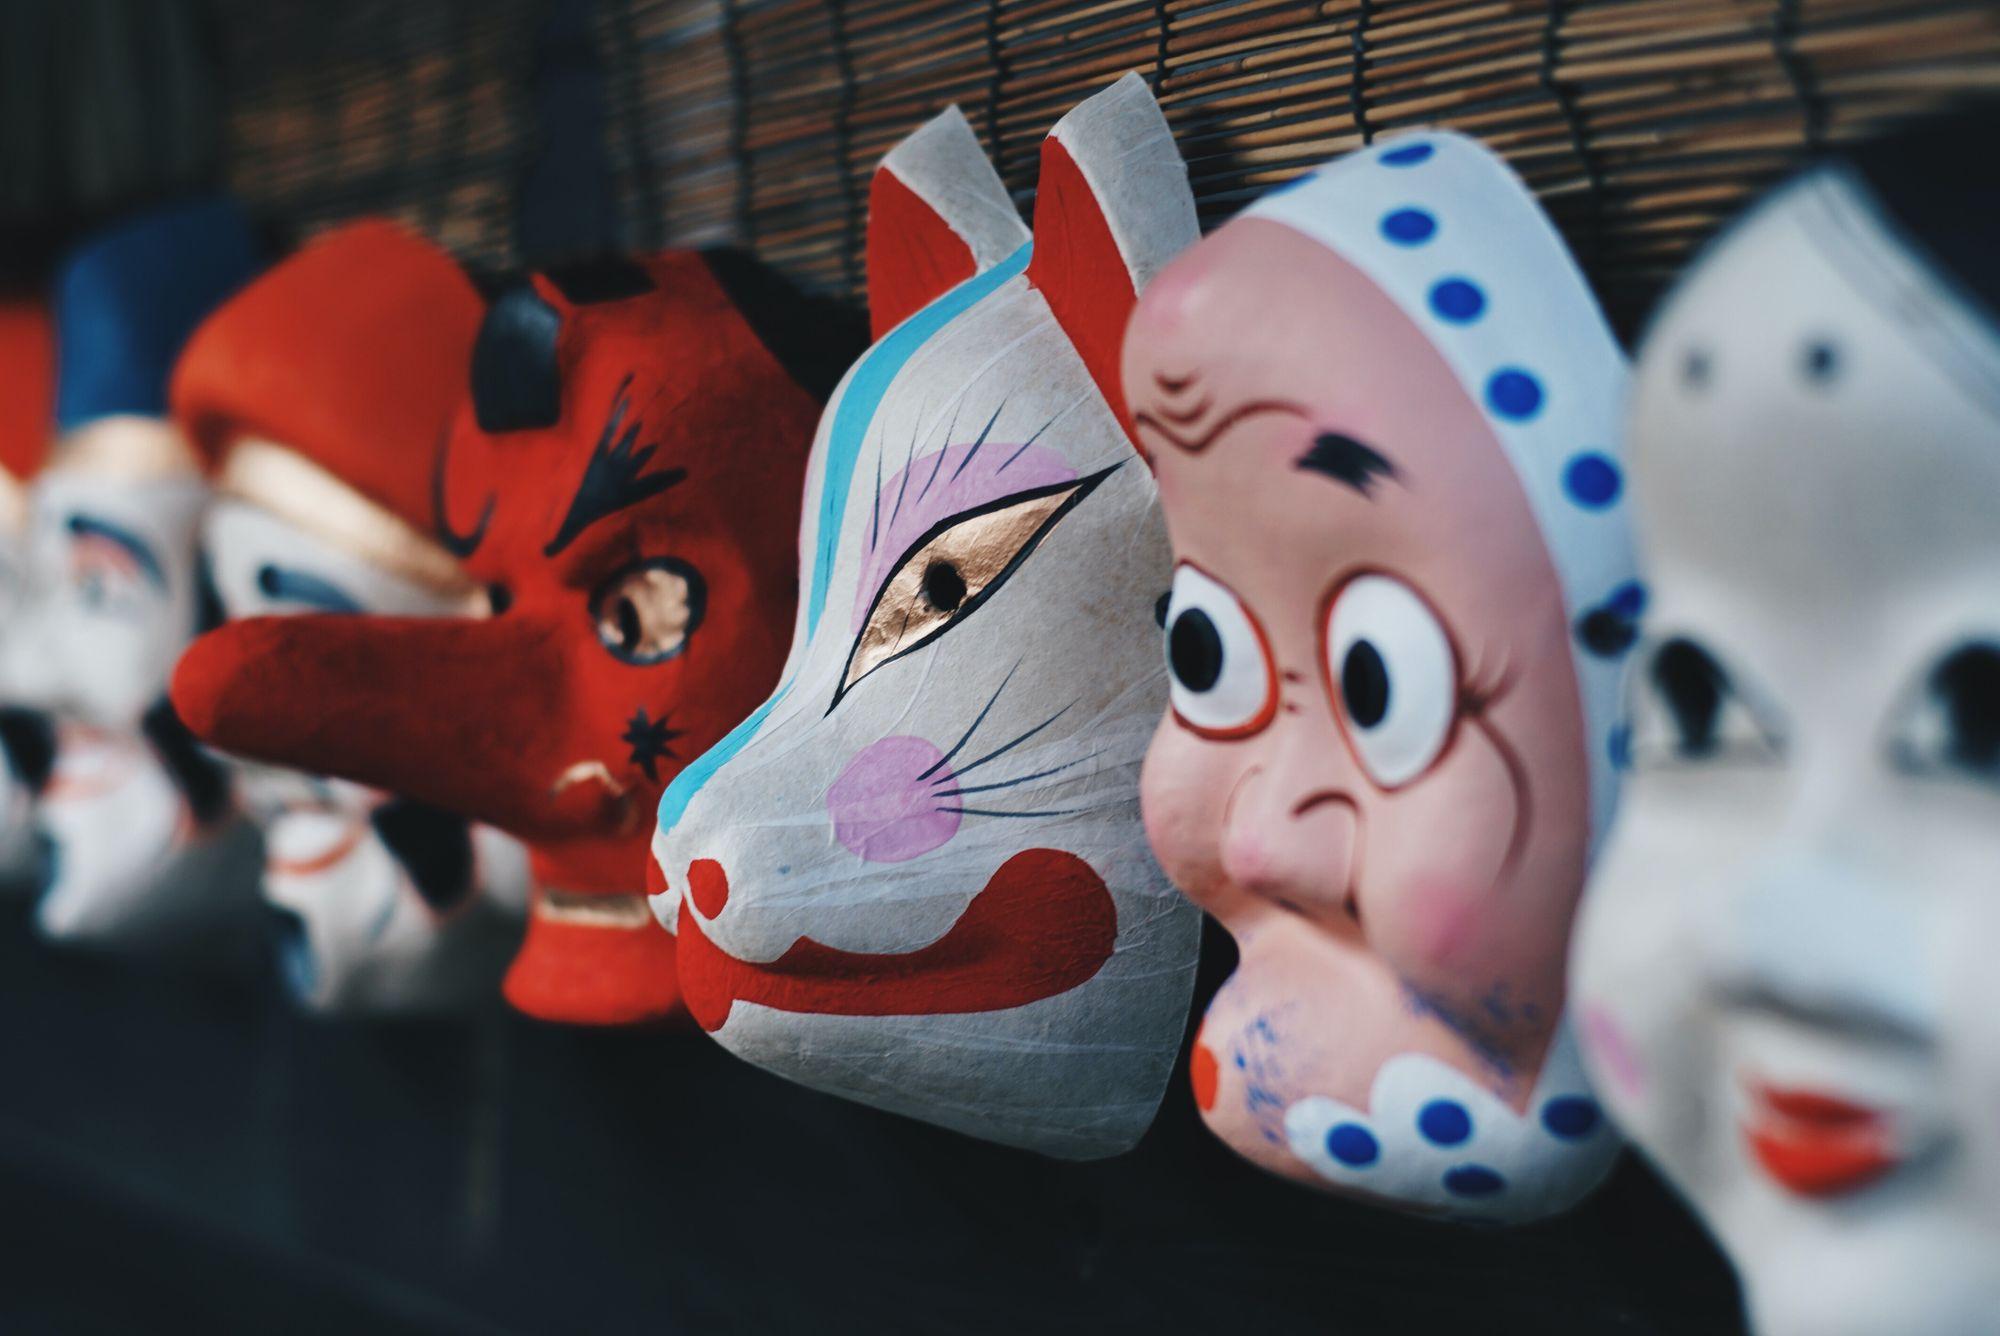 Jung's personas represented as masks